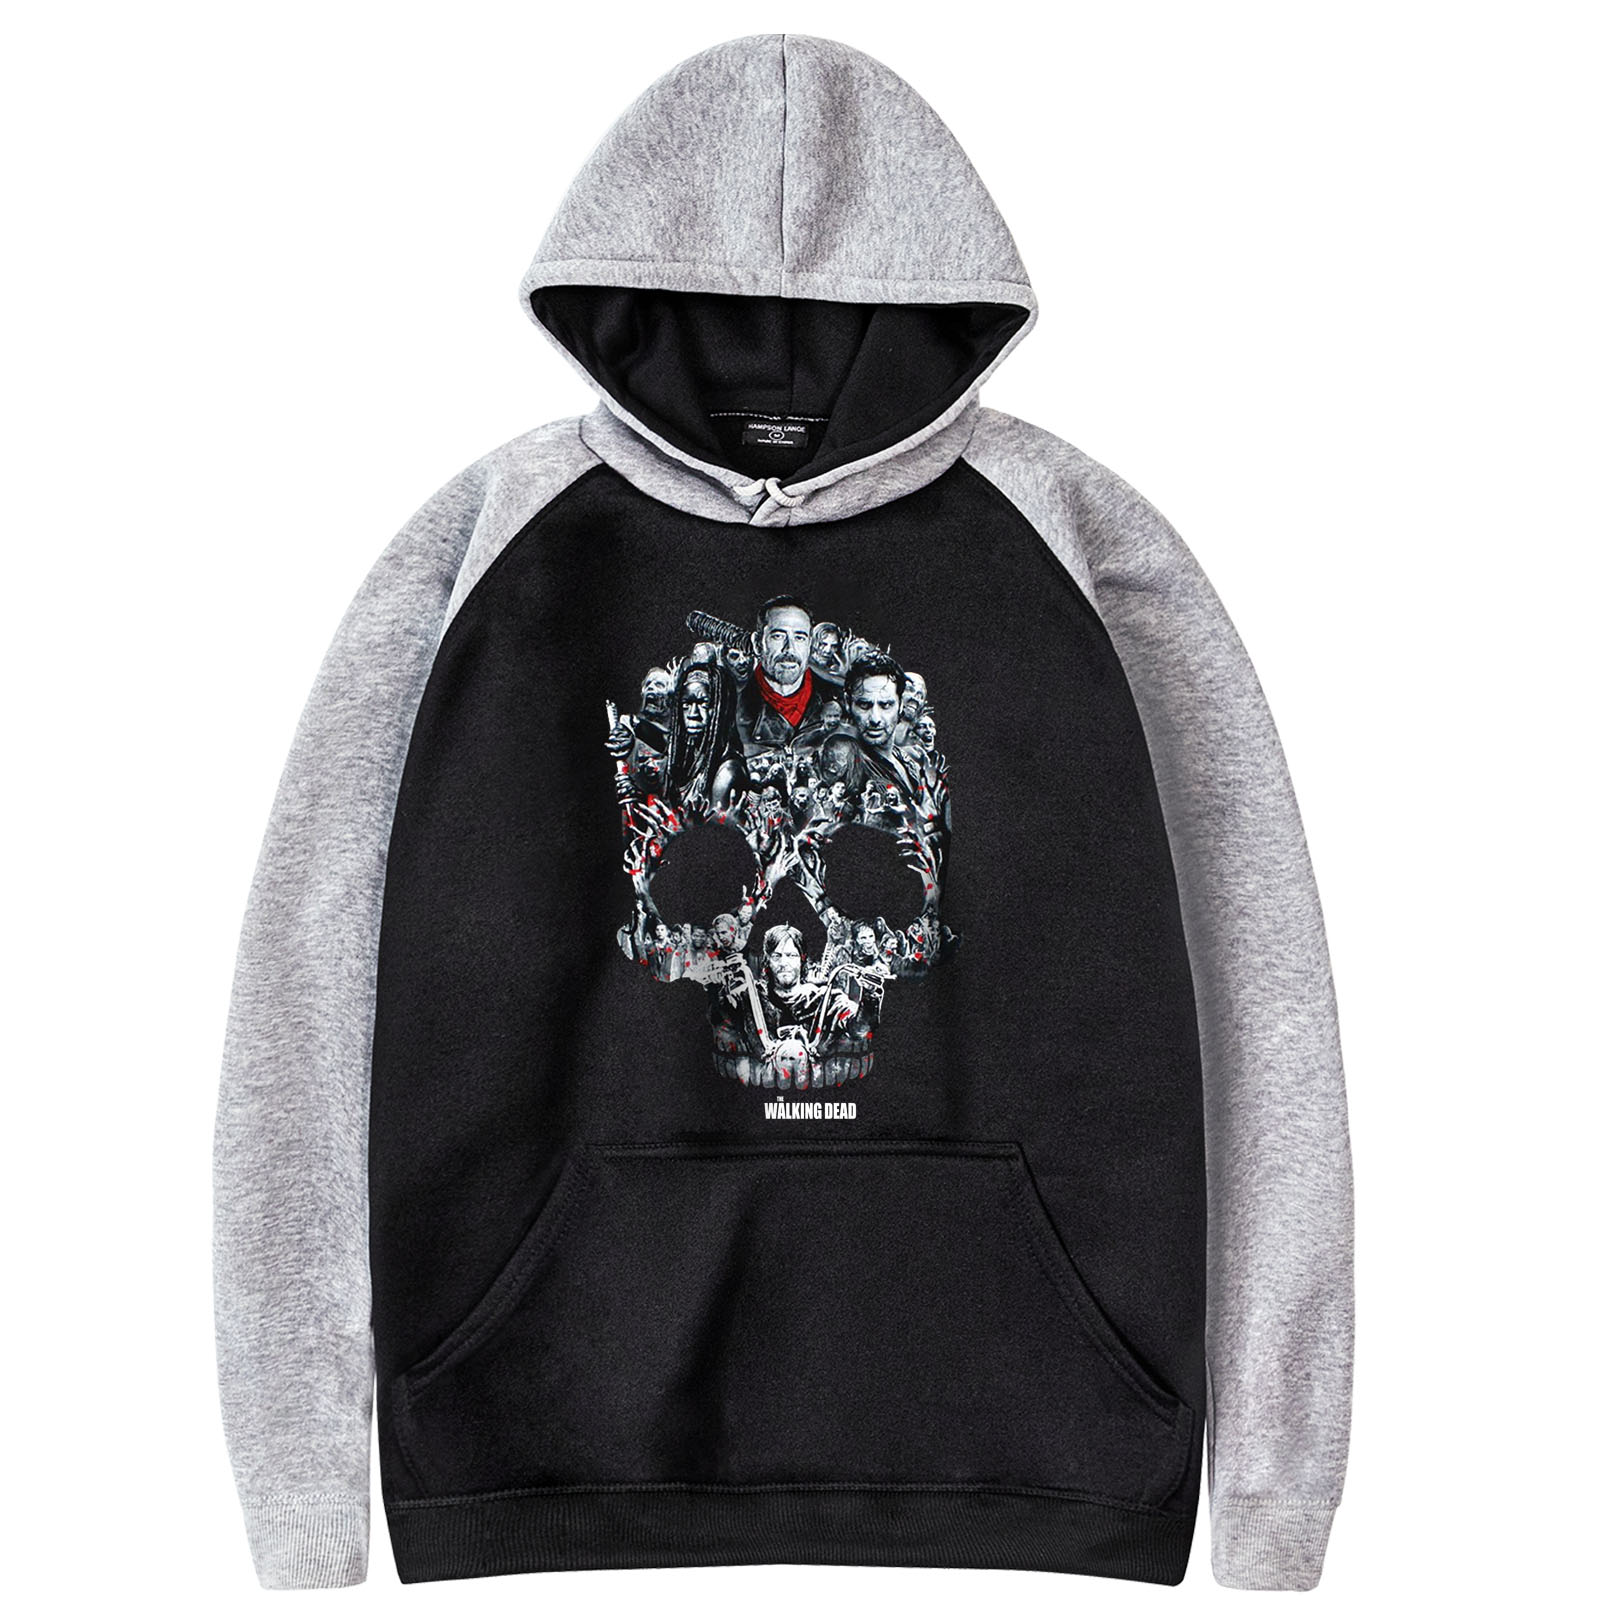 Skull Fashion Printed 2019 Fleence Pullover Hip Hop Men's Sweatshirt Casual Male Sportswear Hooded fleece Harajuku Spring Autumn